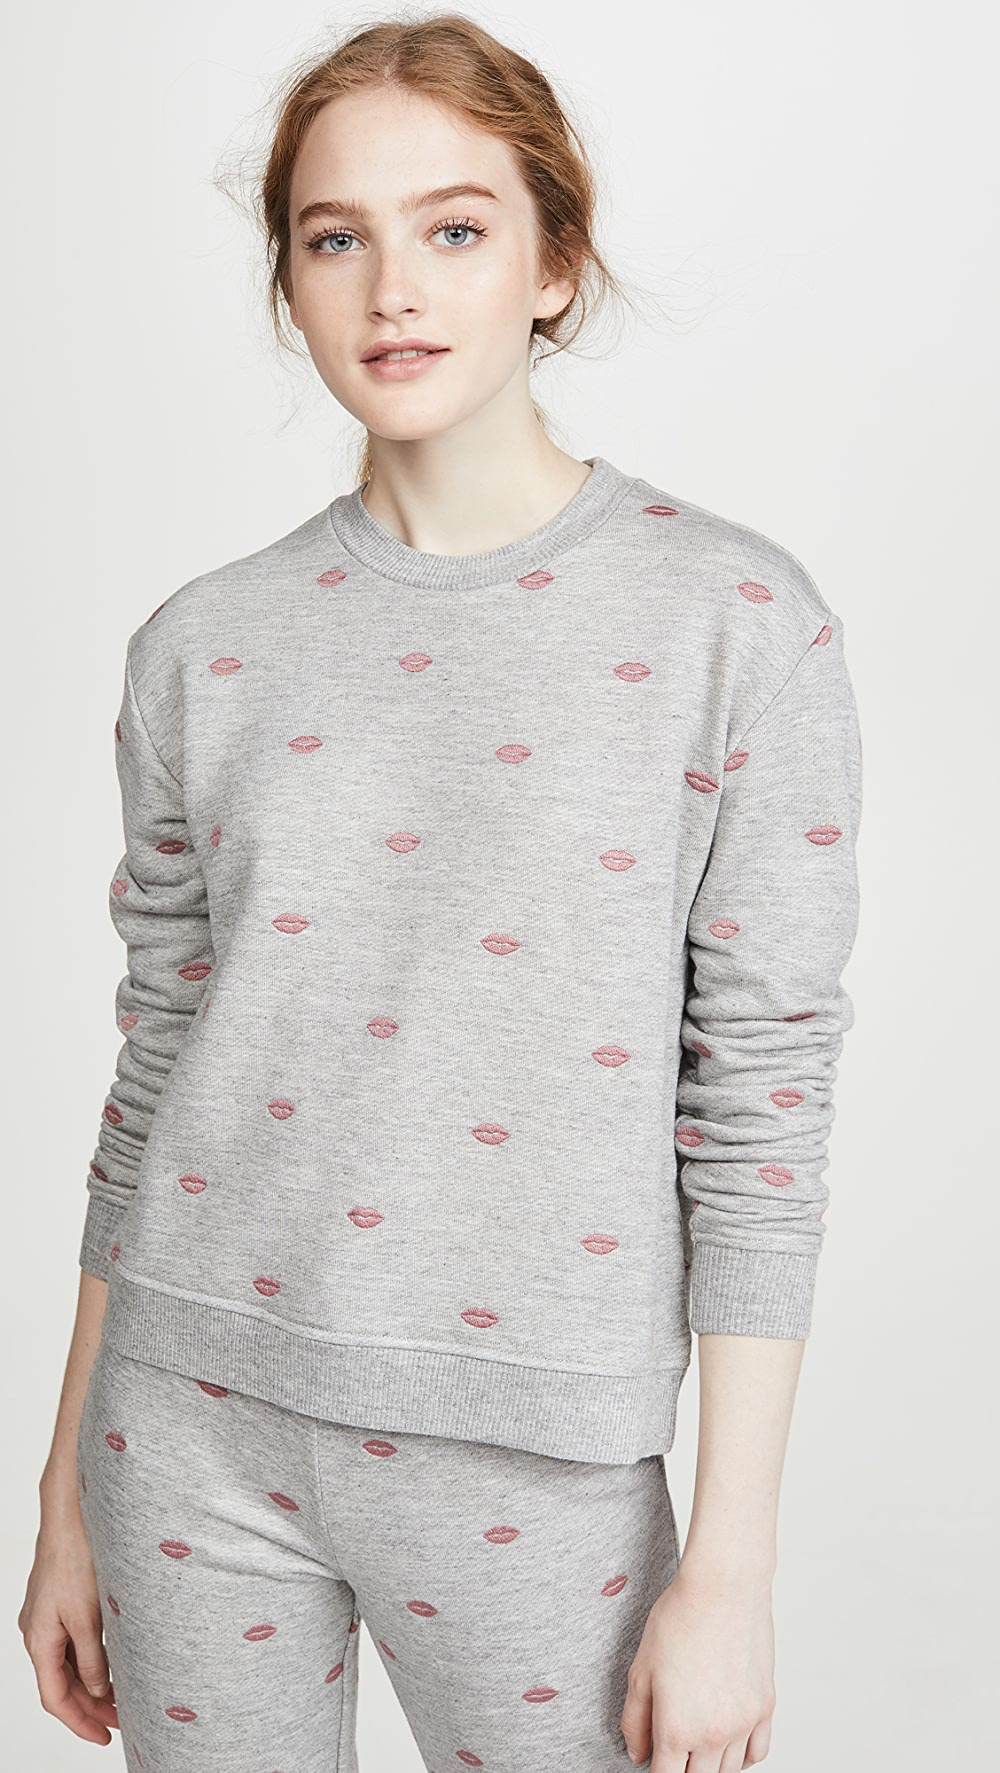 Cheap Sale Splendid - X's & O's Sweatshirt High Quality And Inexpensive